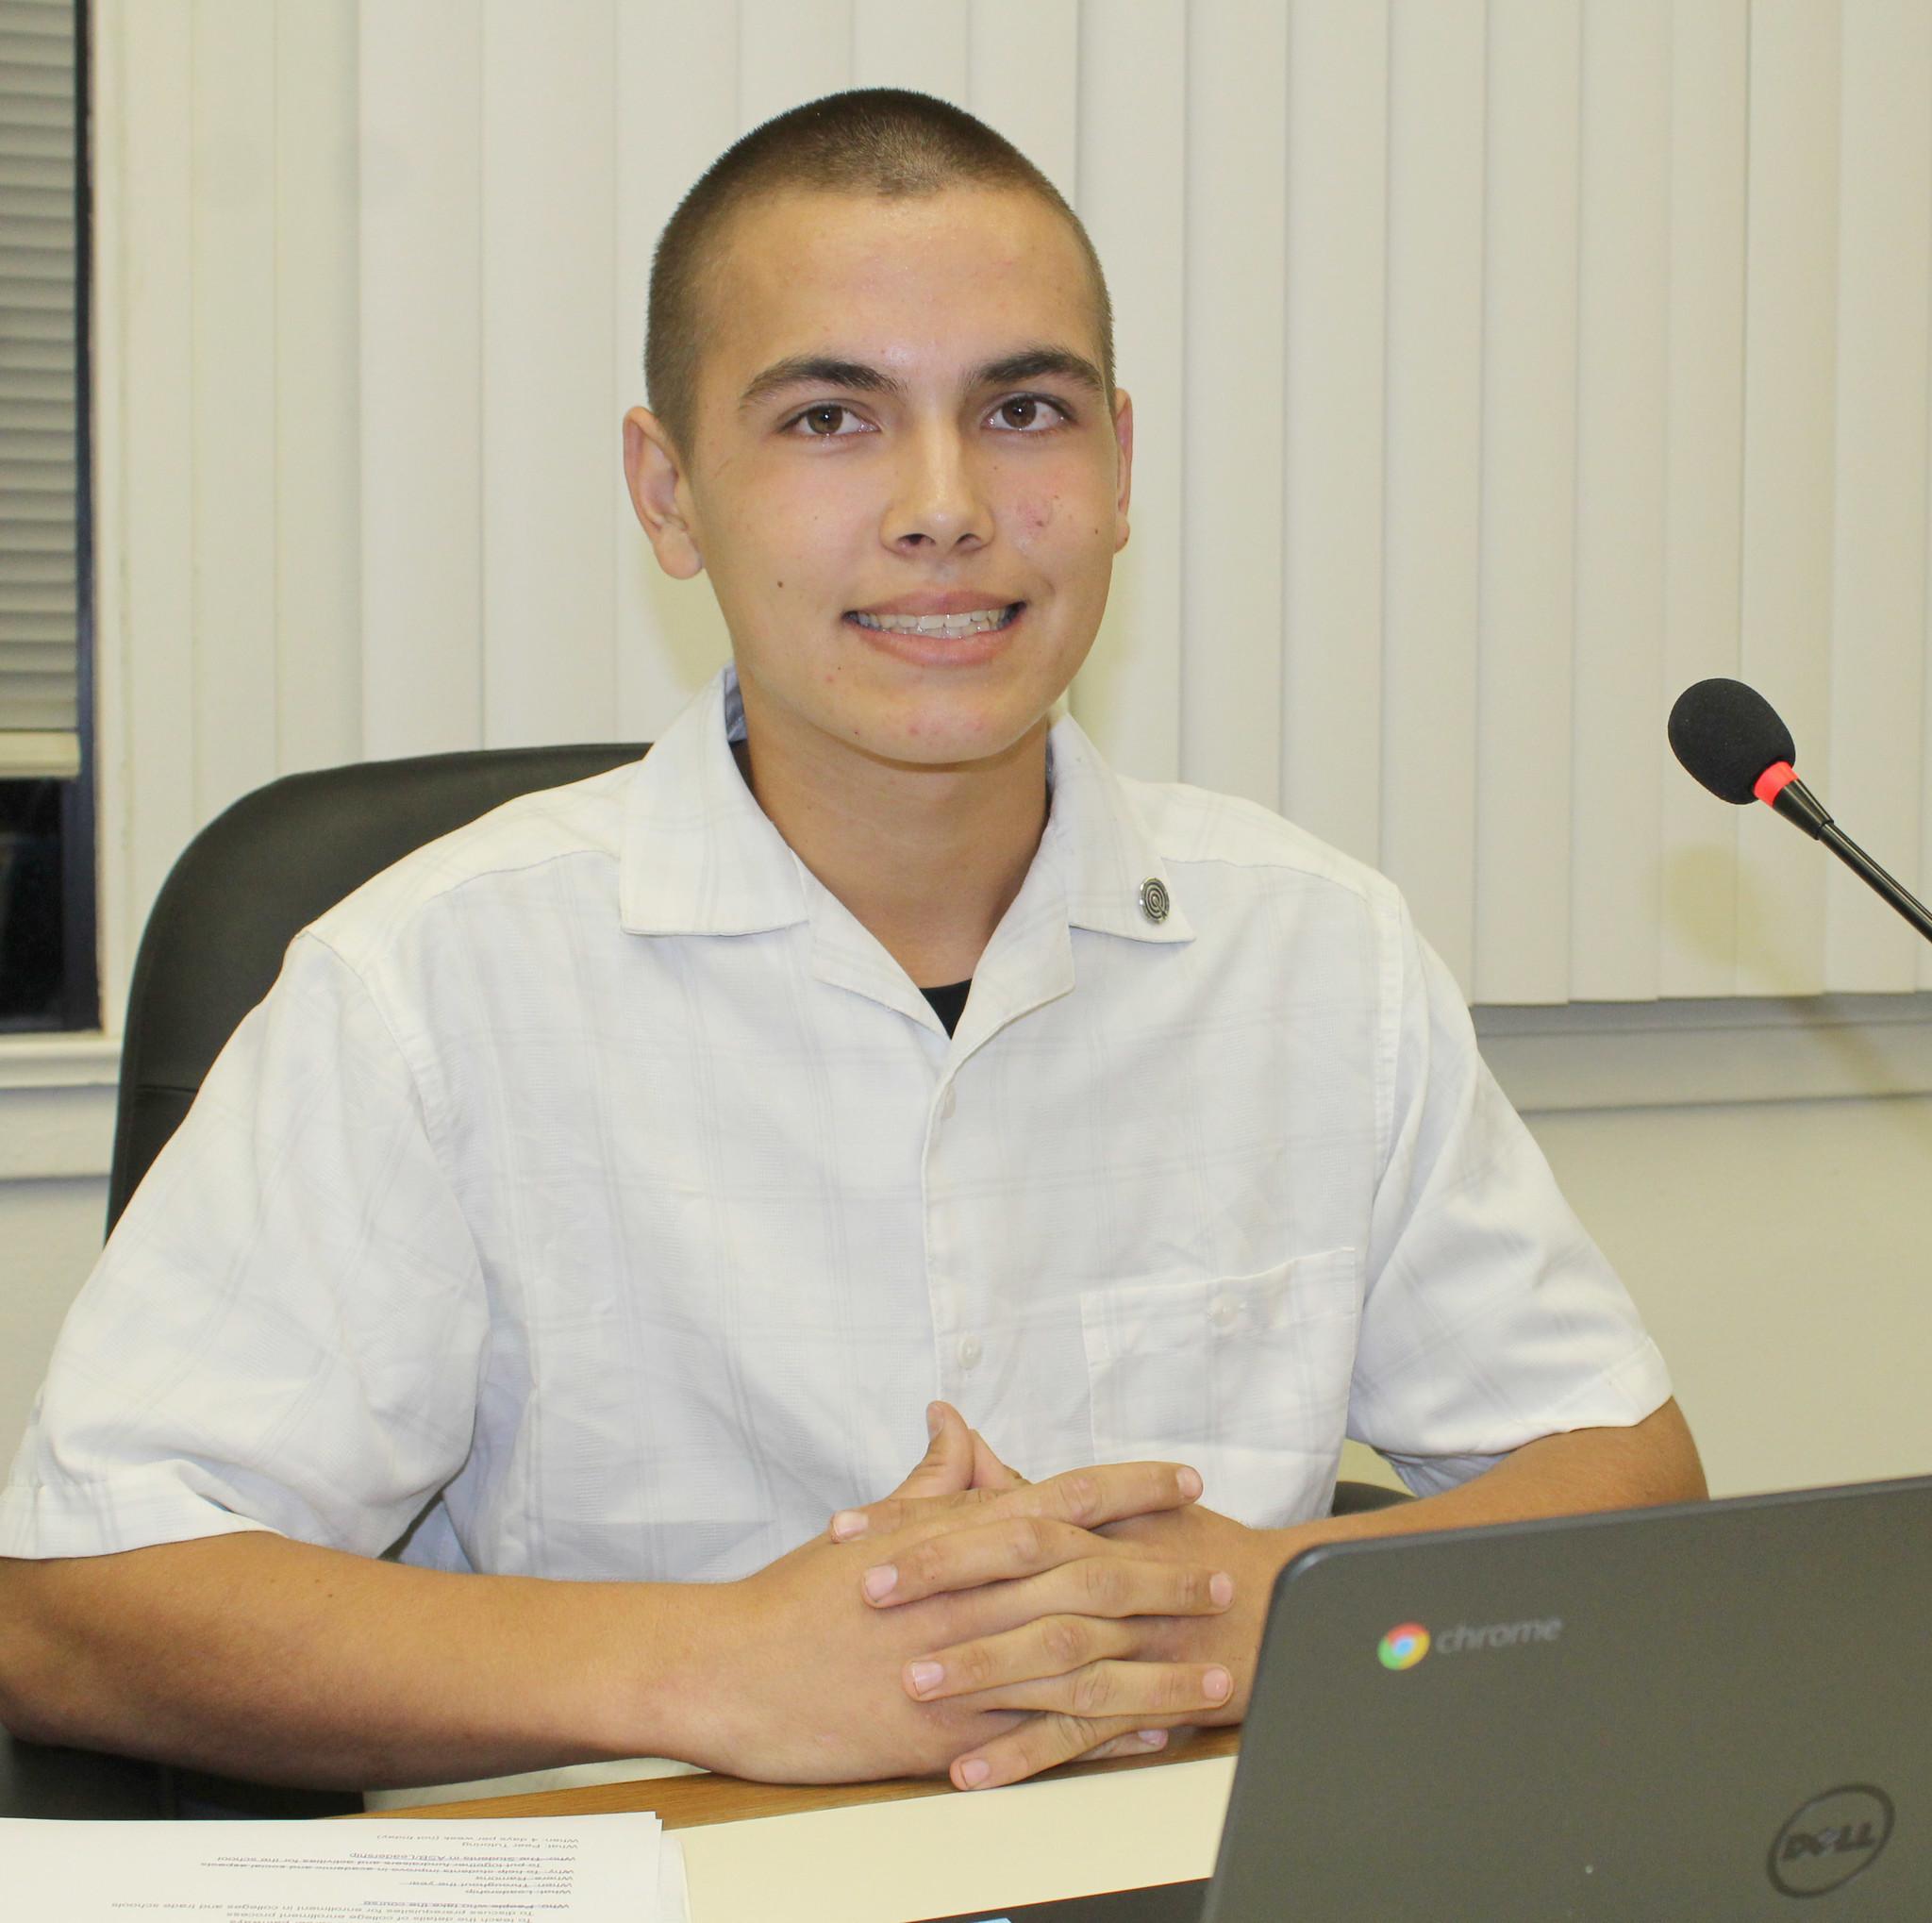 Montecito High School junior Michael Caparas represents his school at Ramona Unified board meetings.